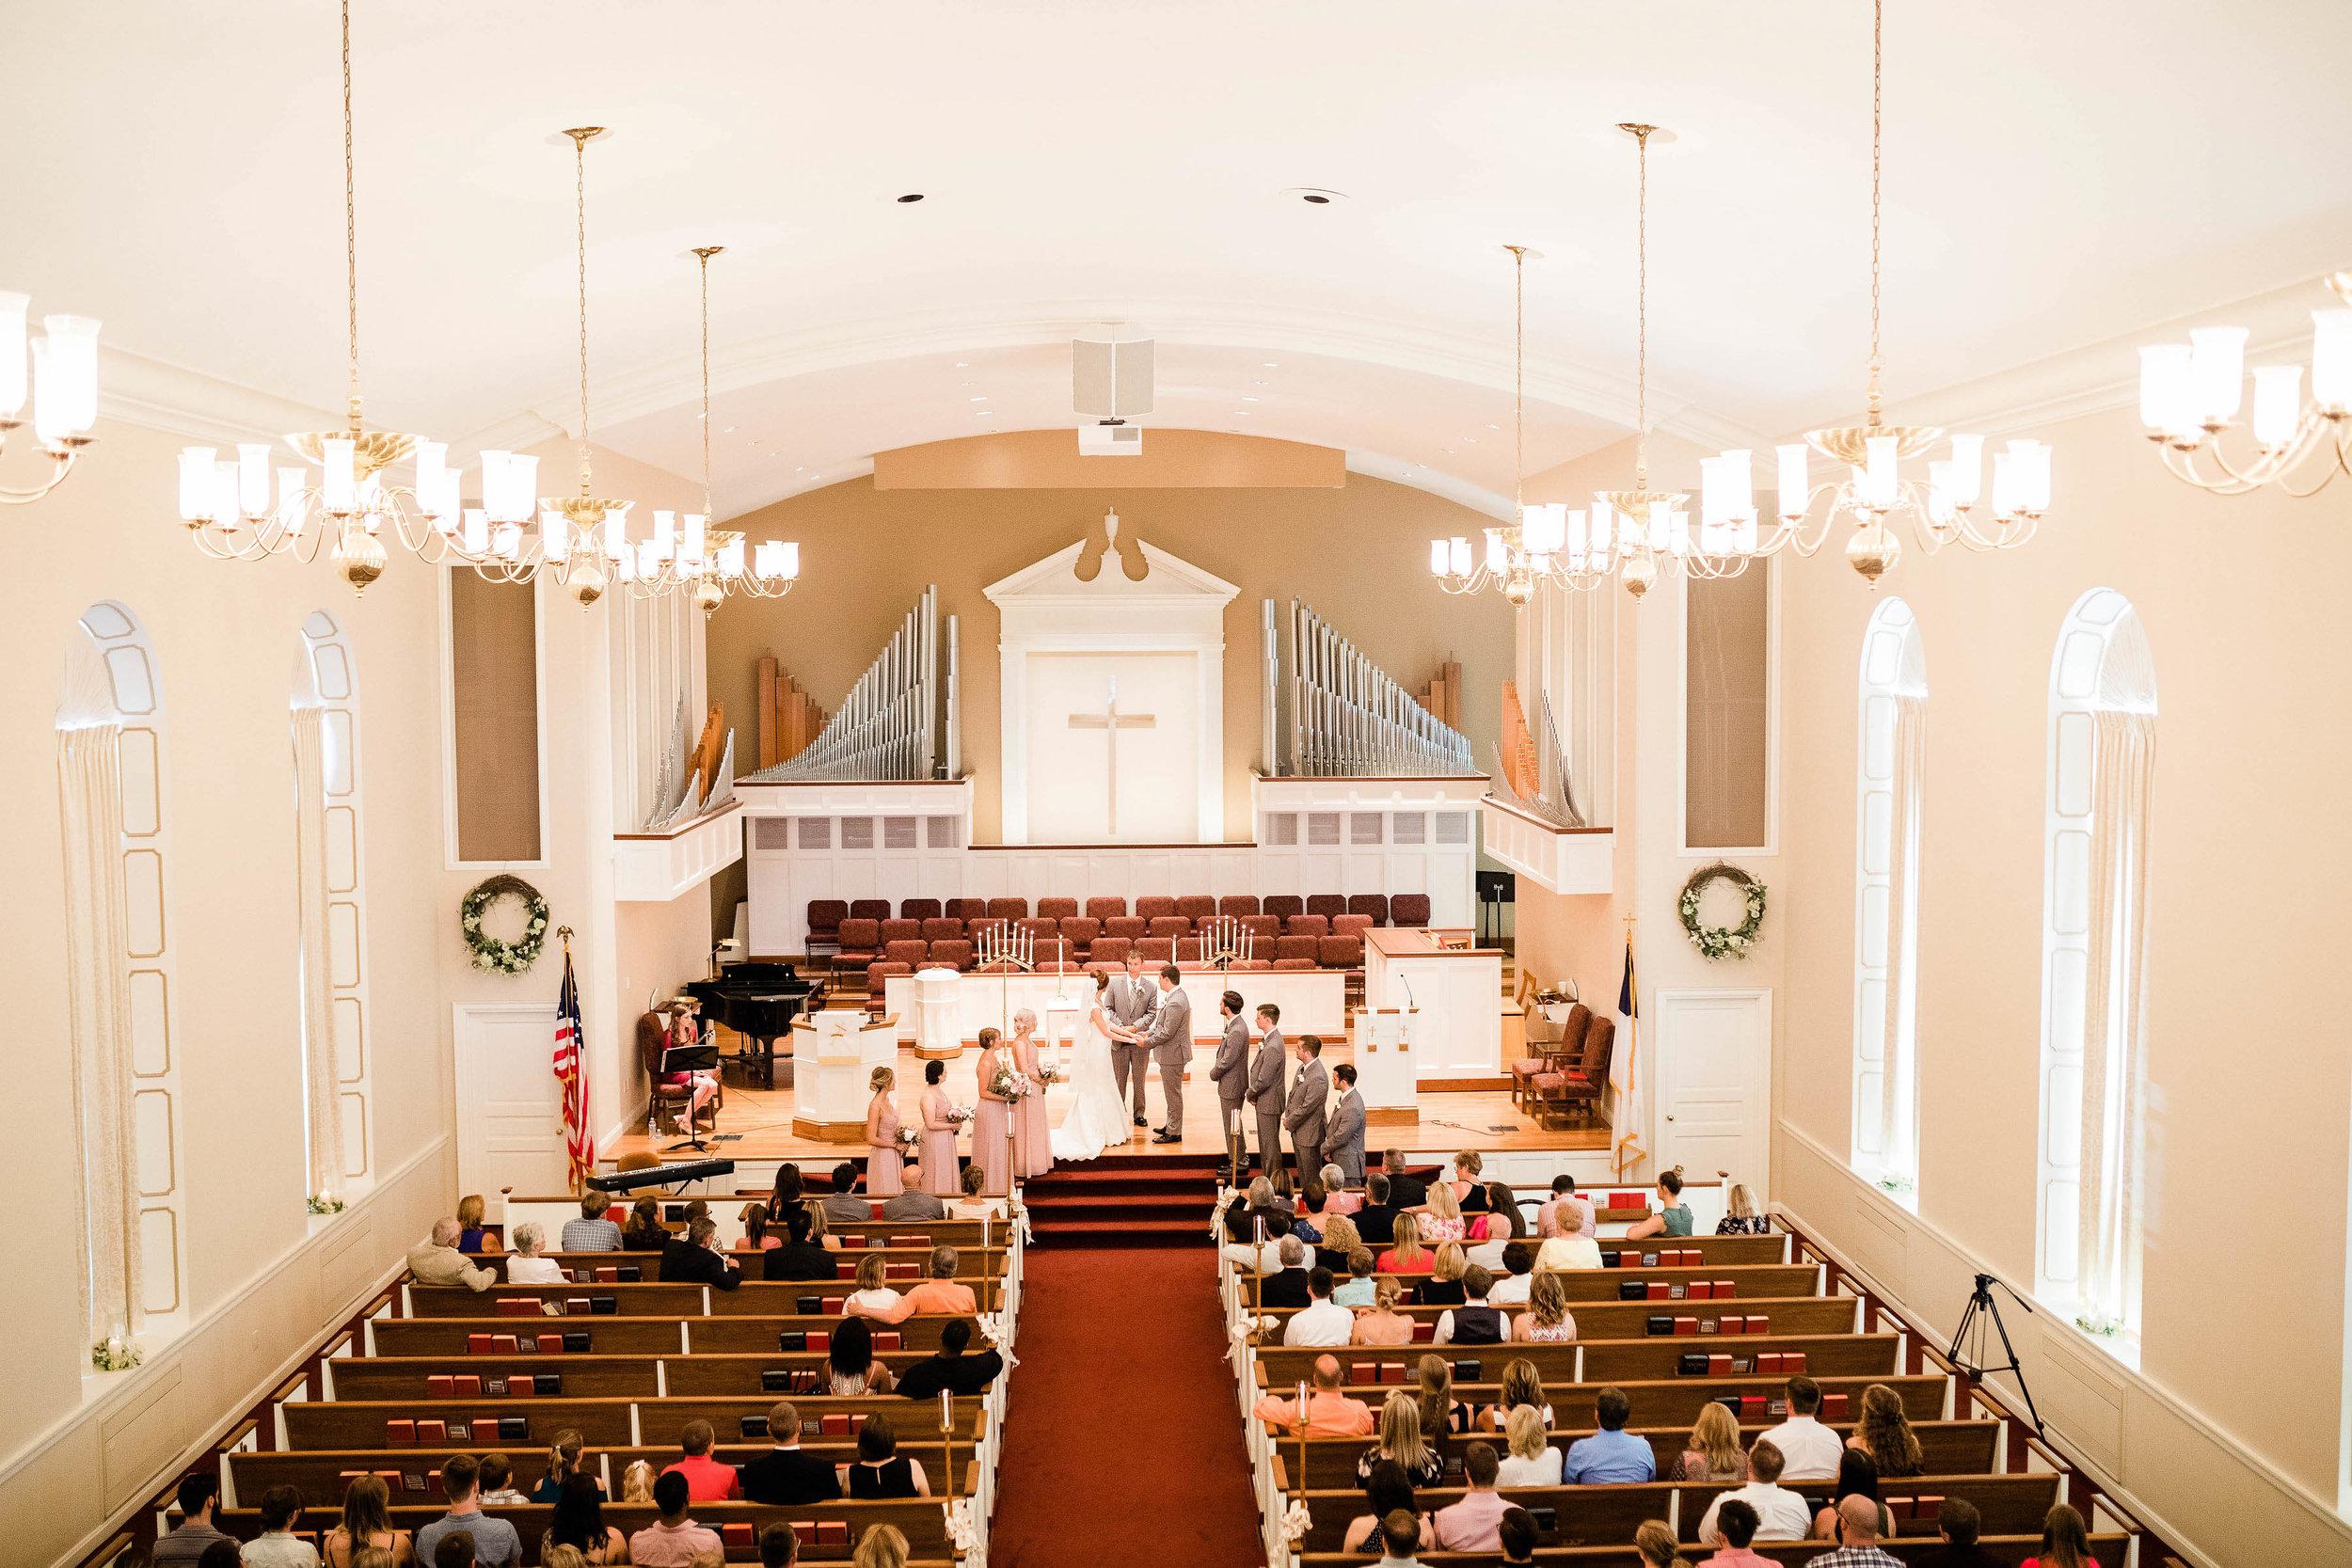 anderson hills united methodist church wedding cincinnati ohio-3.jpg